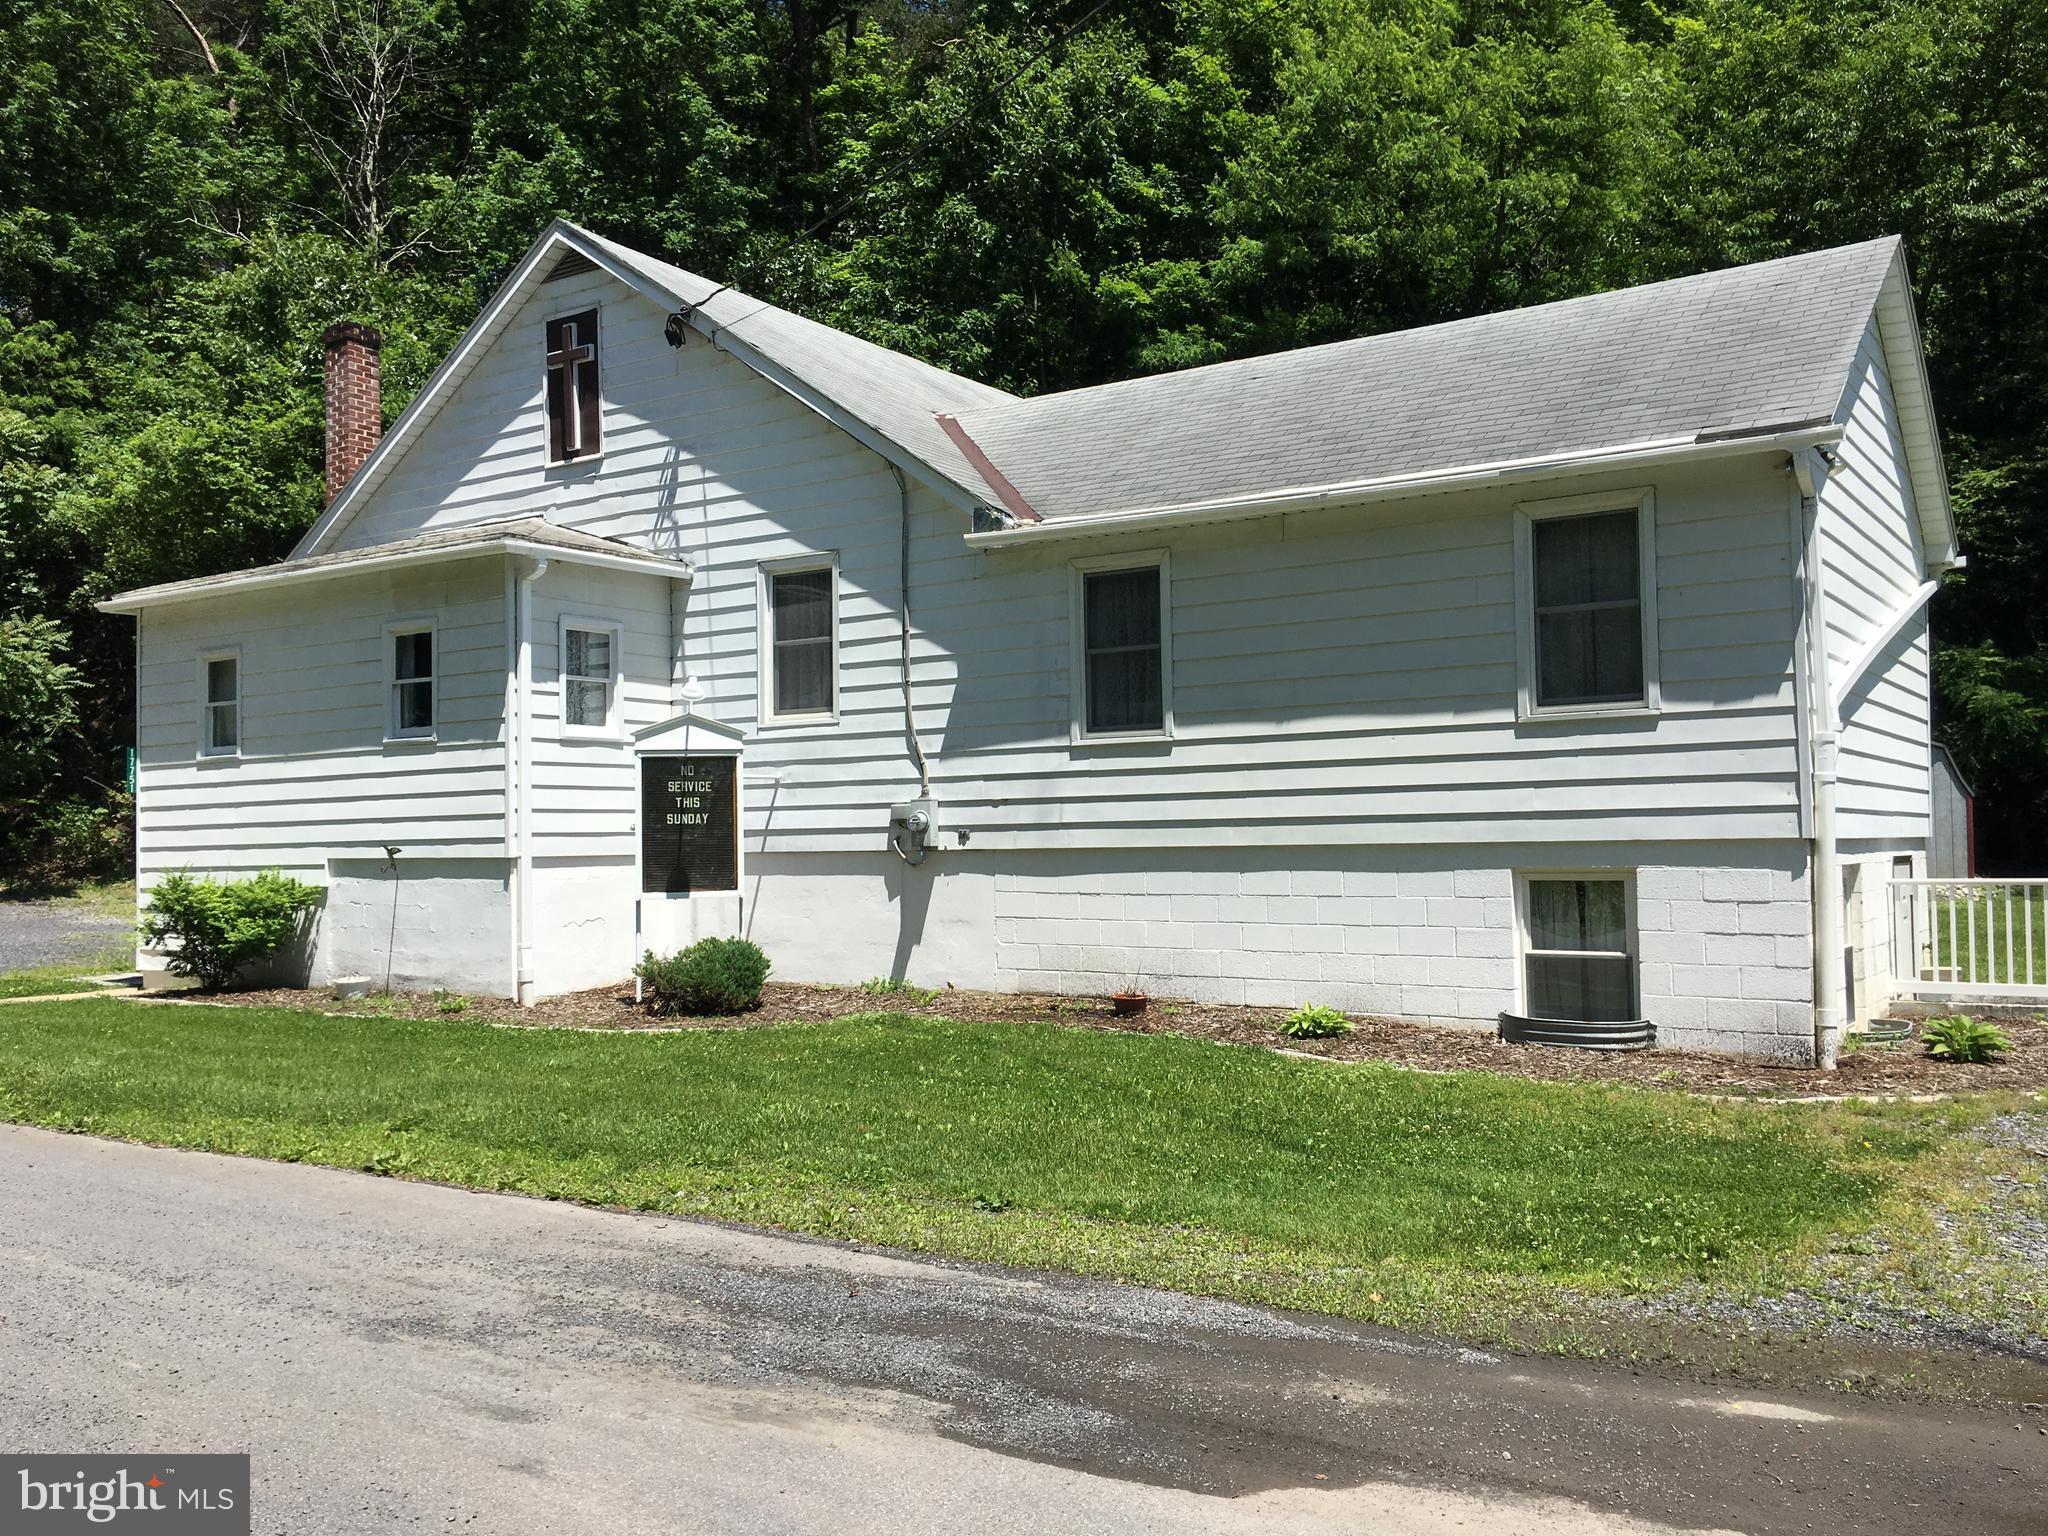 17751 ALLISON ROAD, BLAIRS MILLS, PA 17213